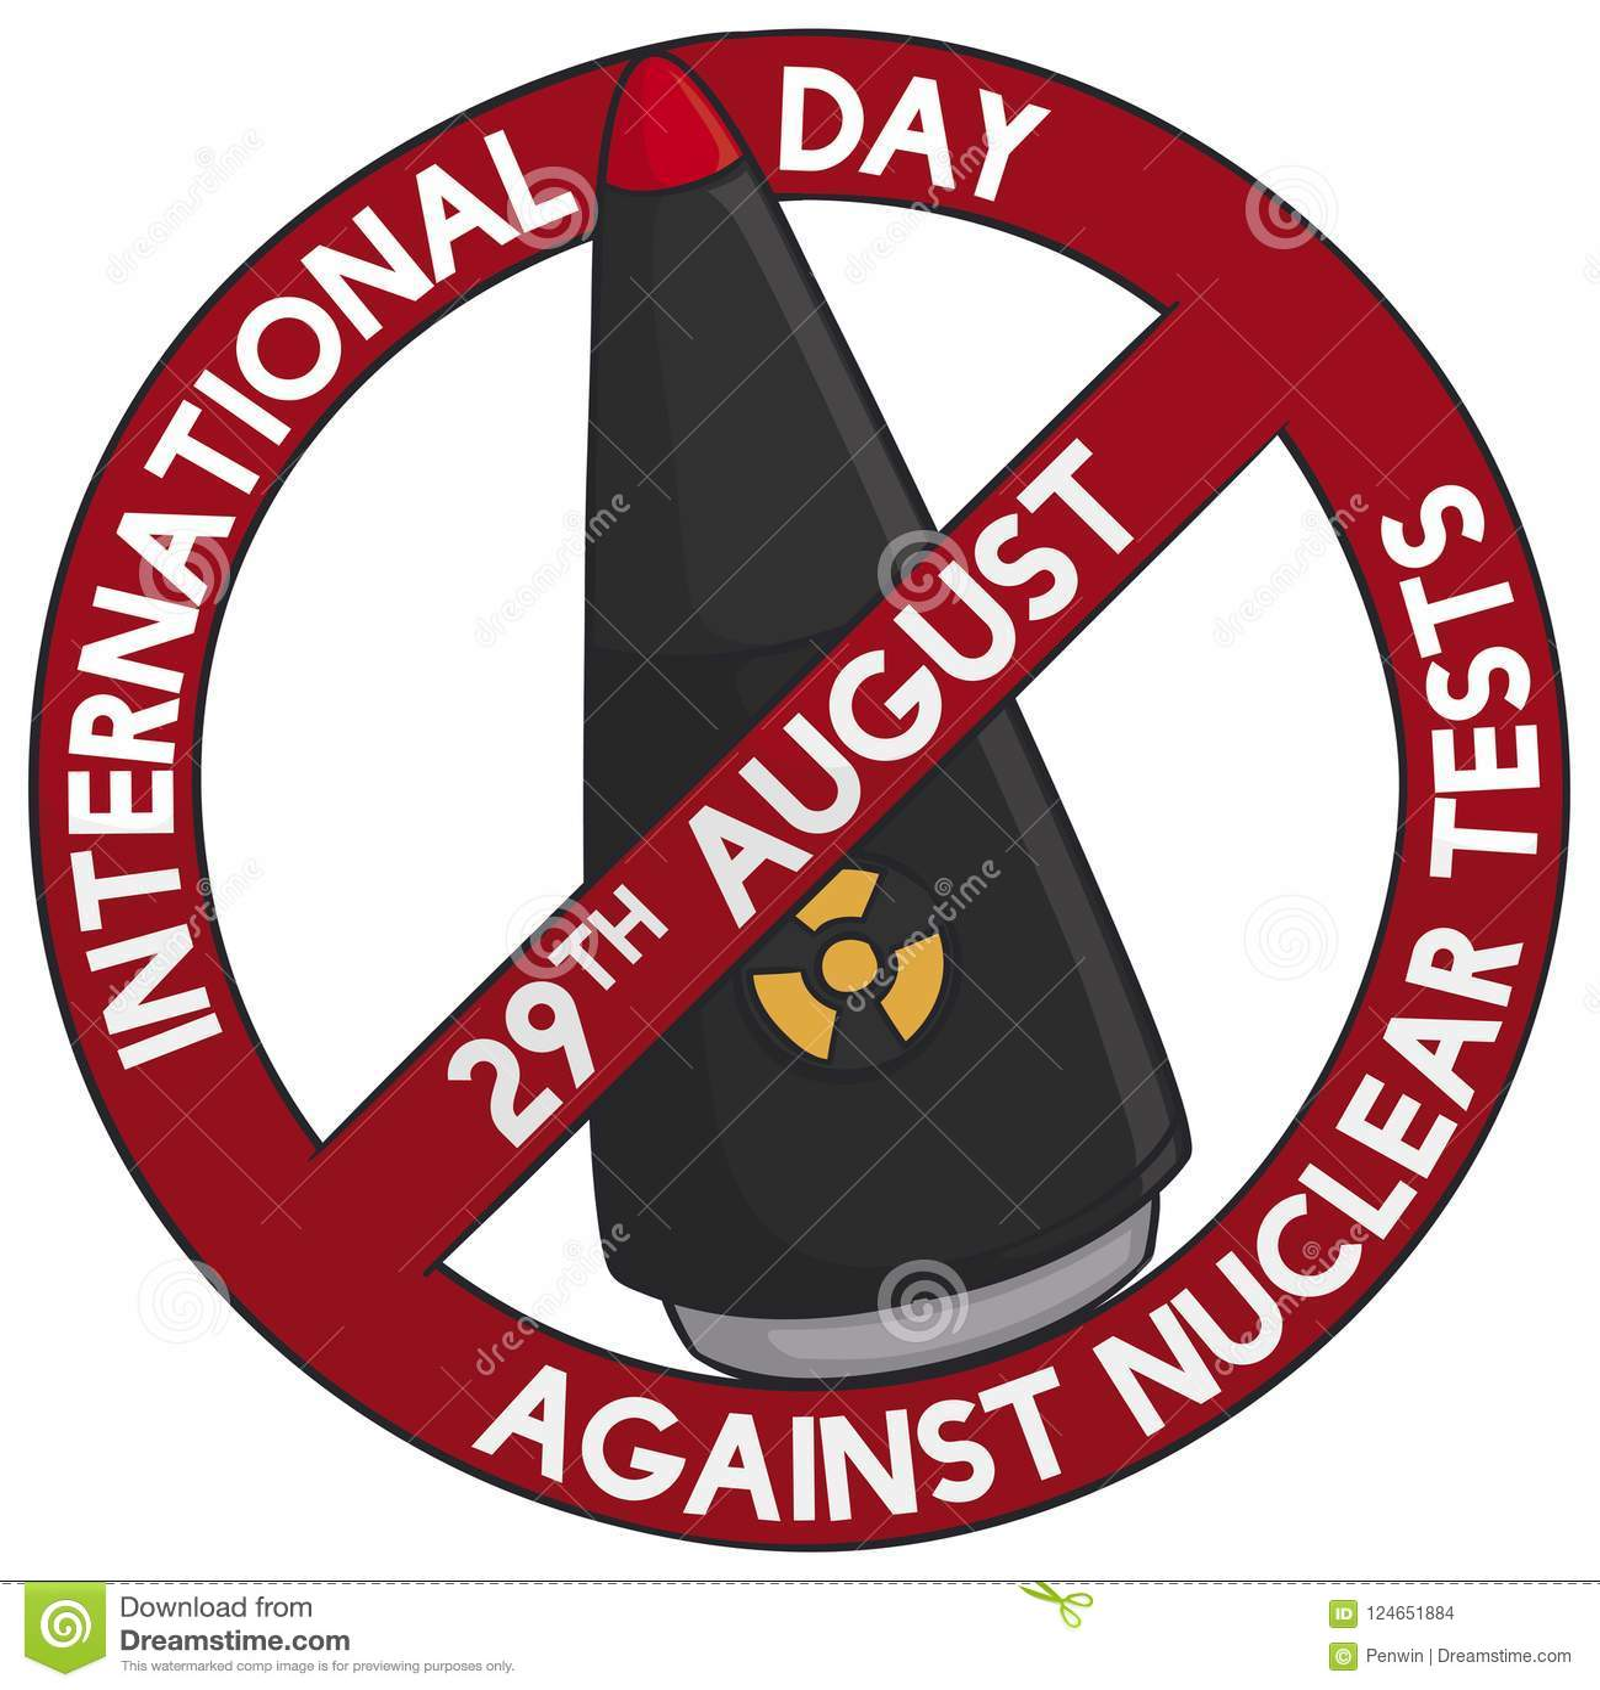 Warhead Inside Forbidden Symbol For International Day Against